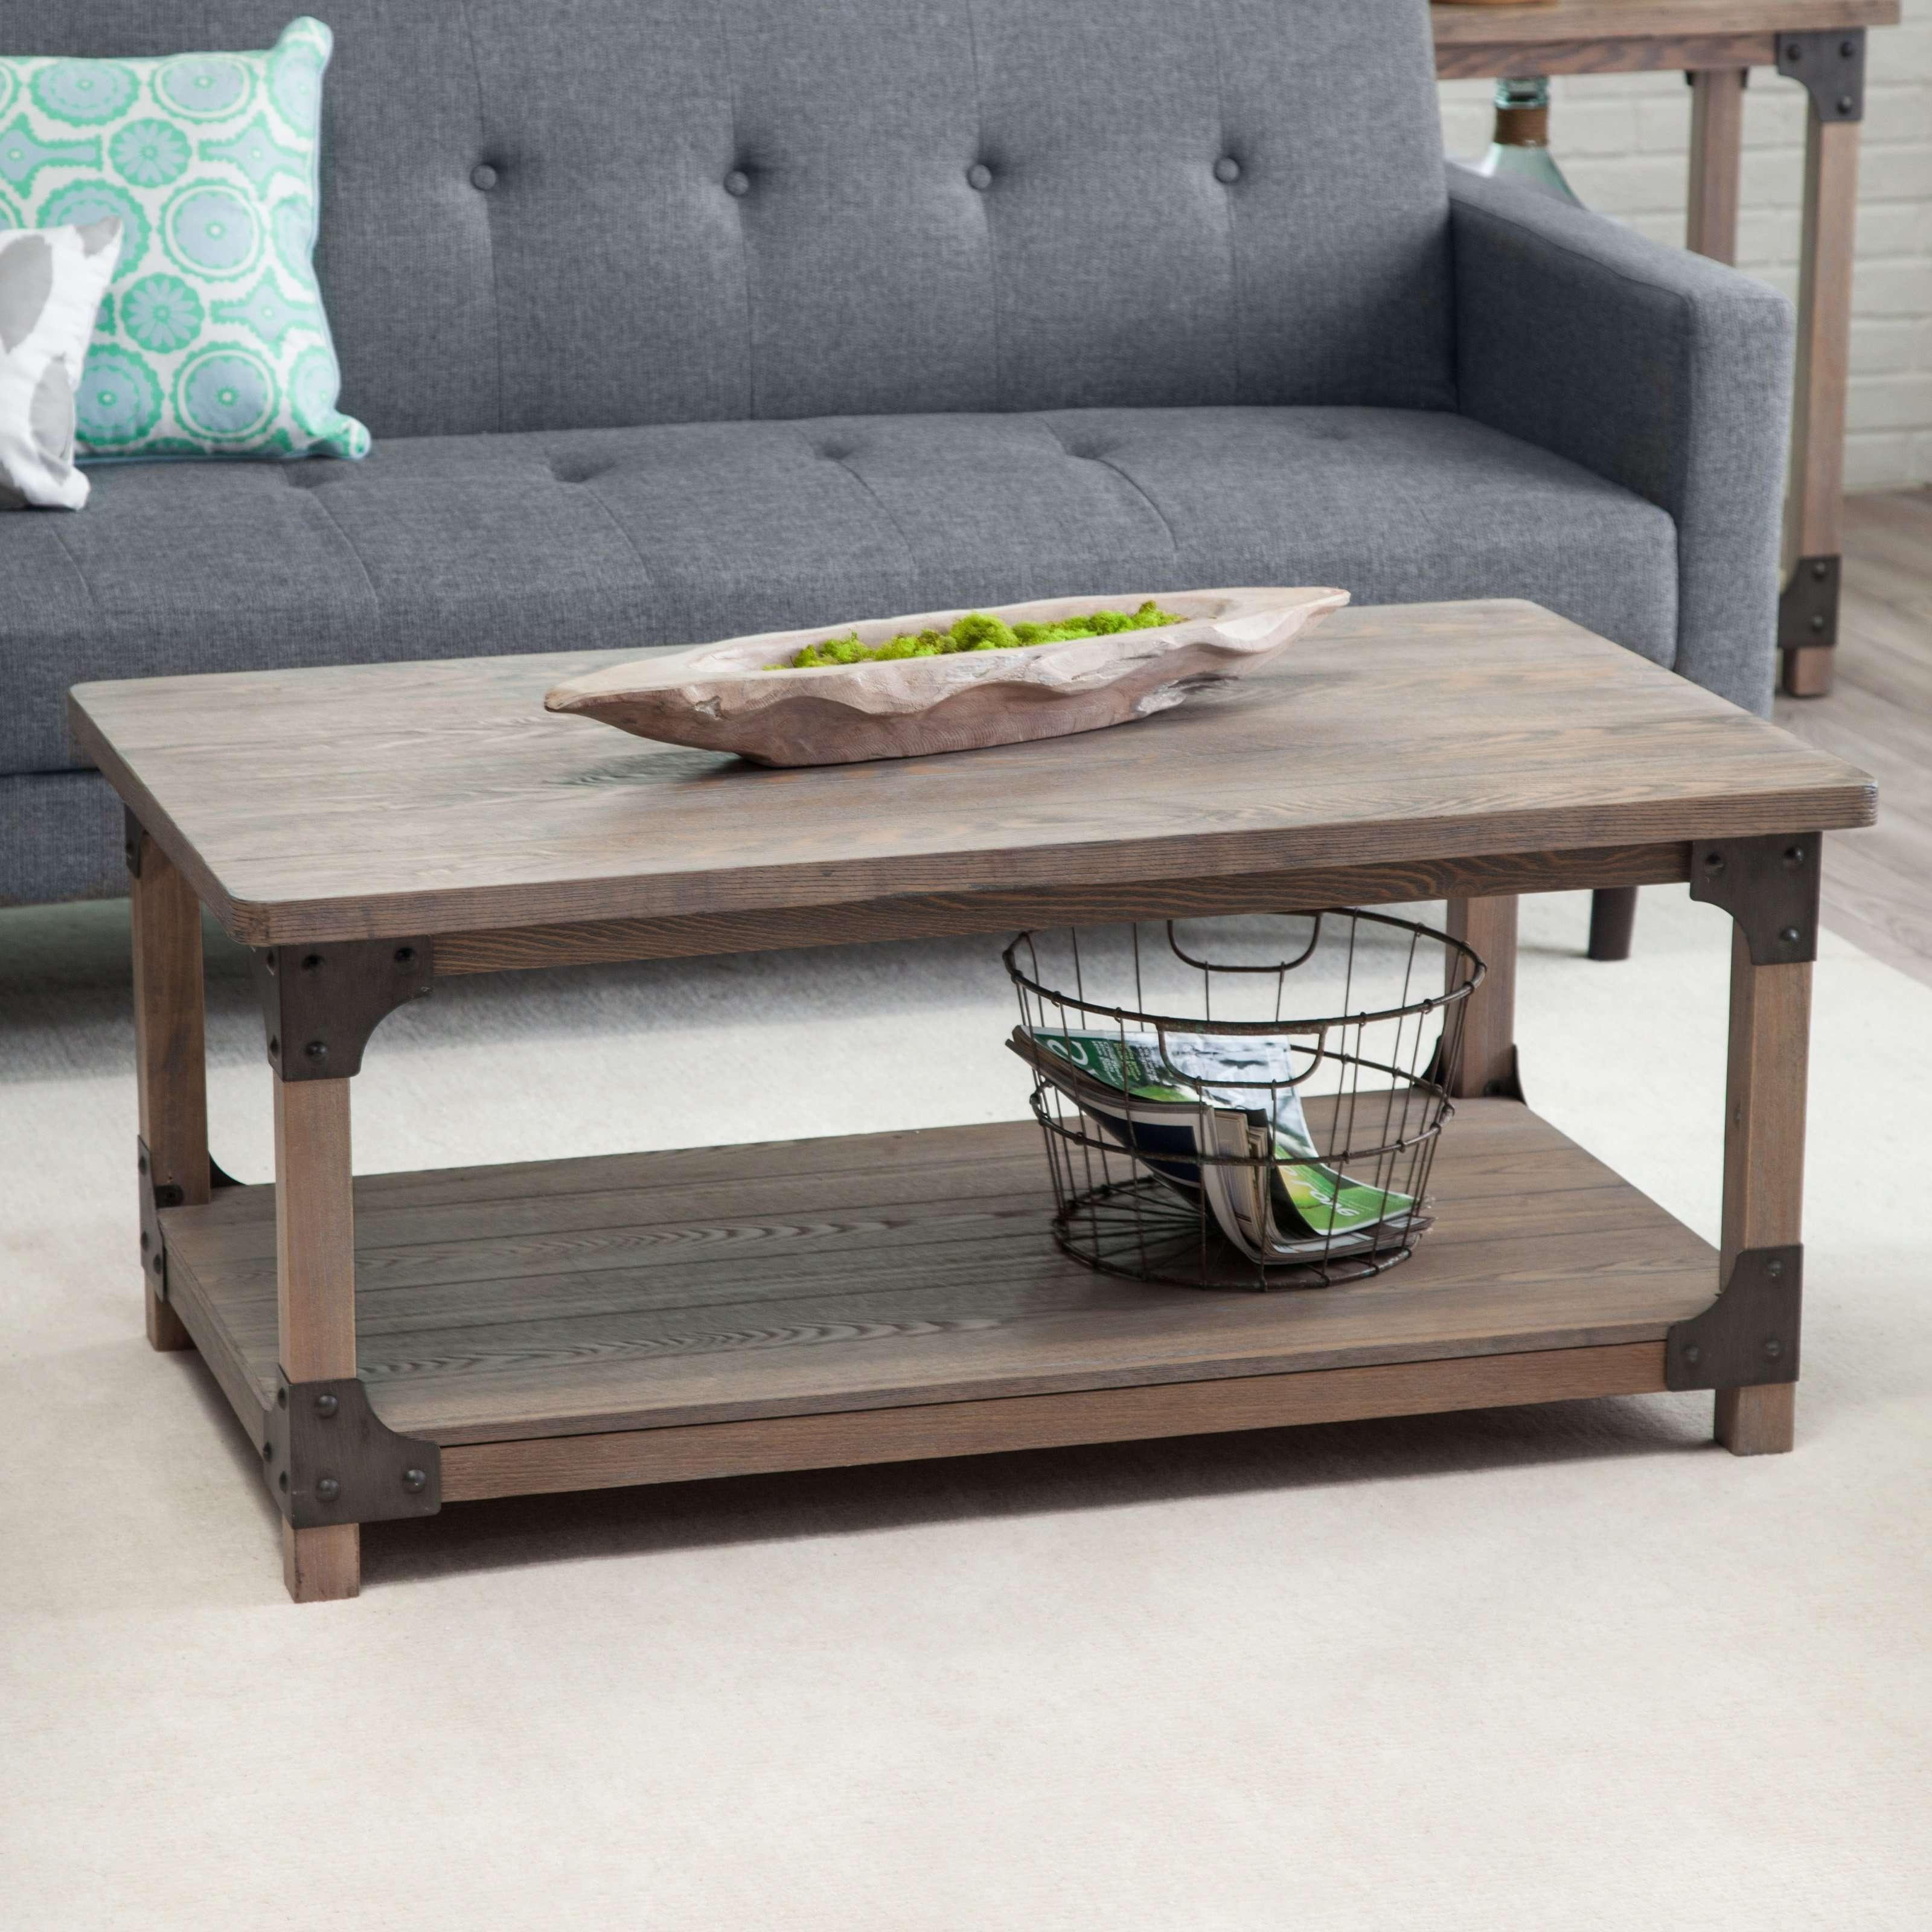 Belham Living Edison Reclaimed Wood Coffee Table (View 10 of 20)